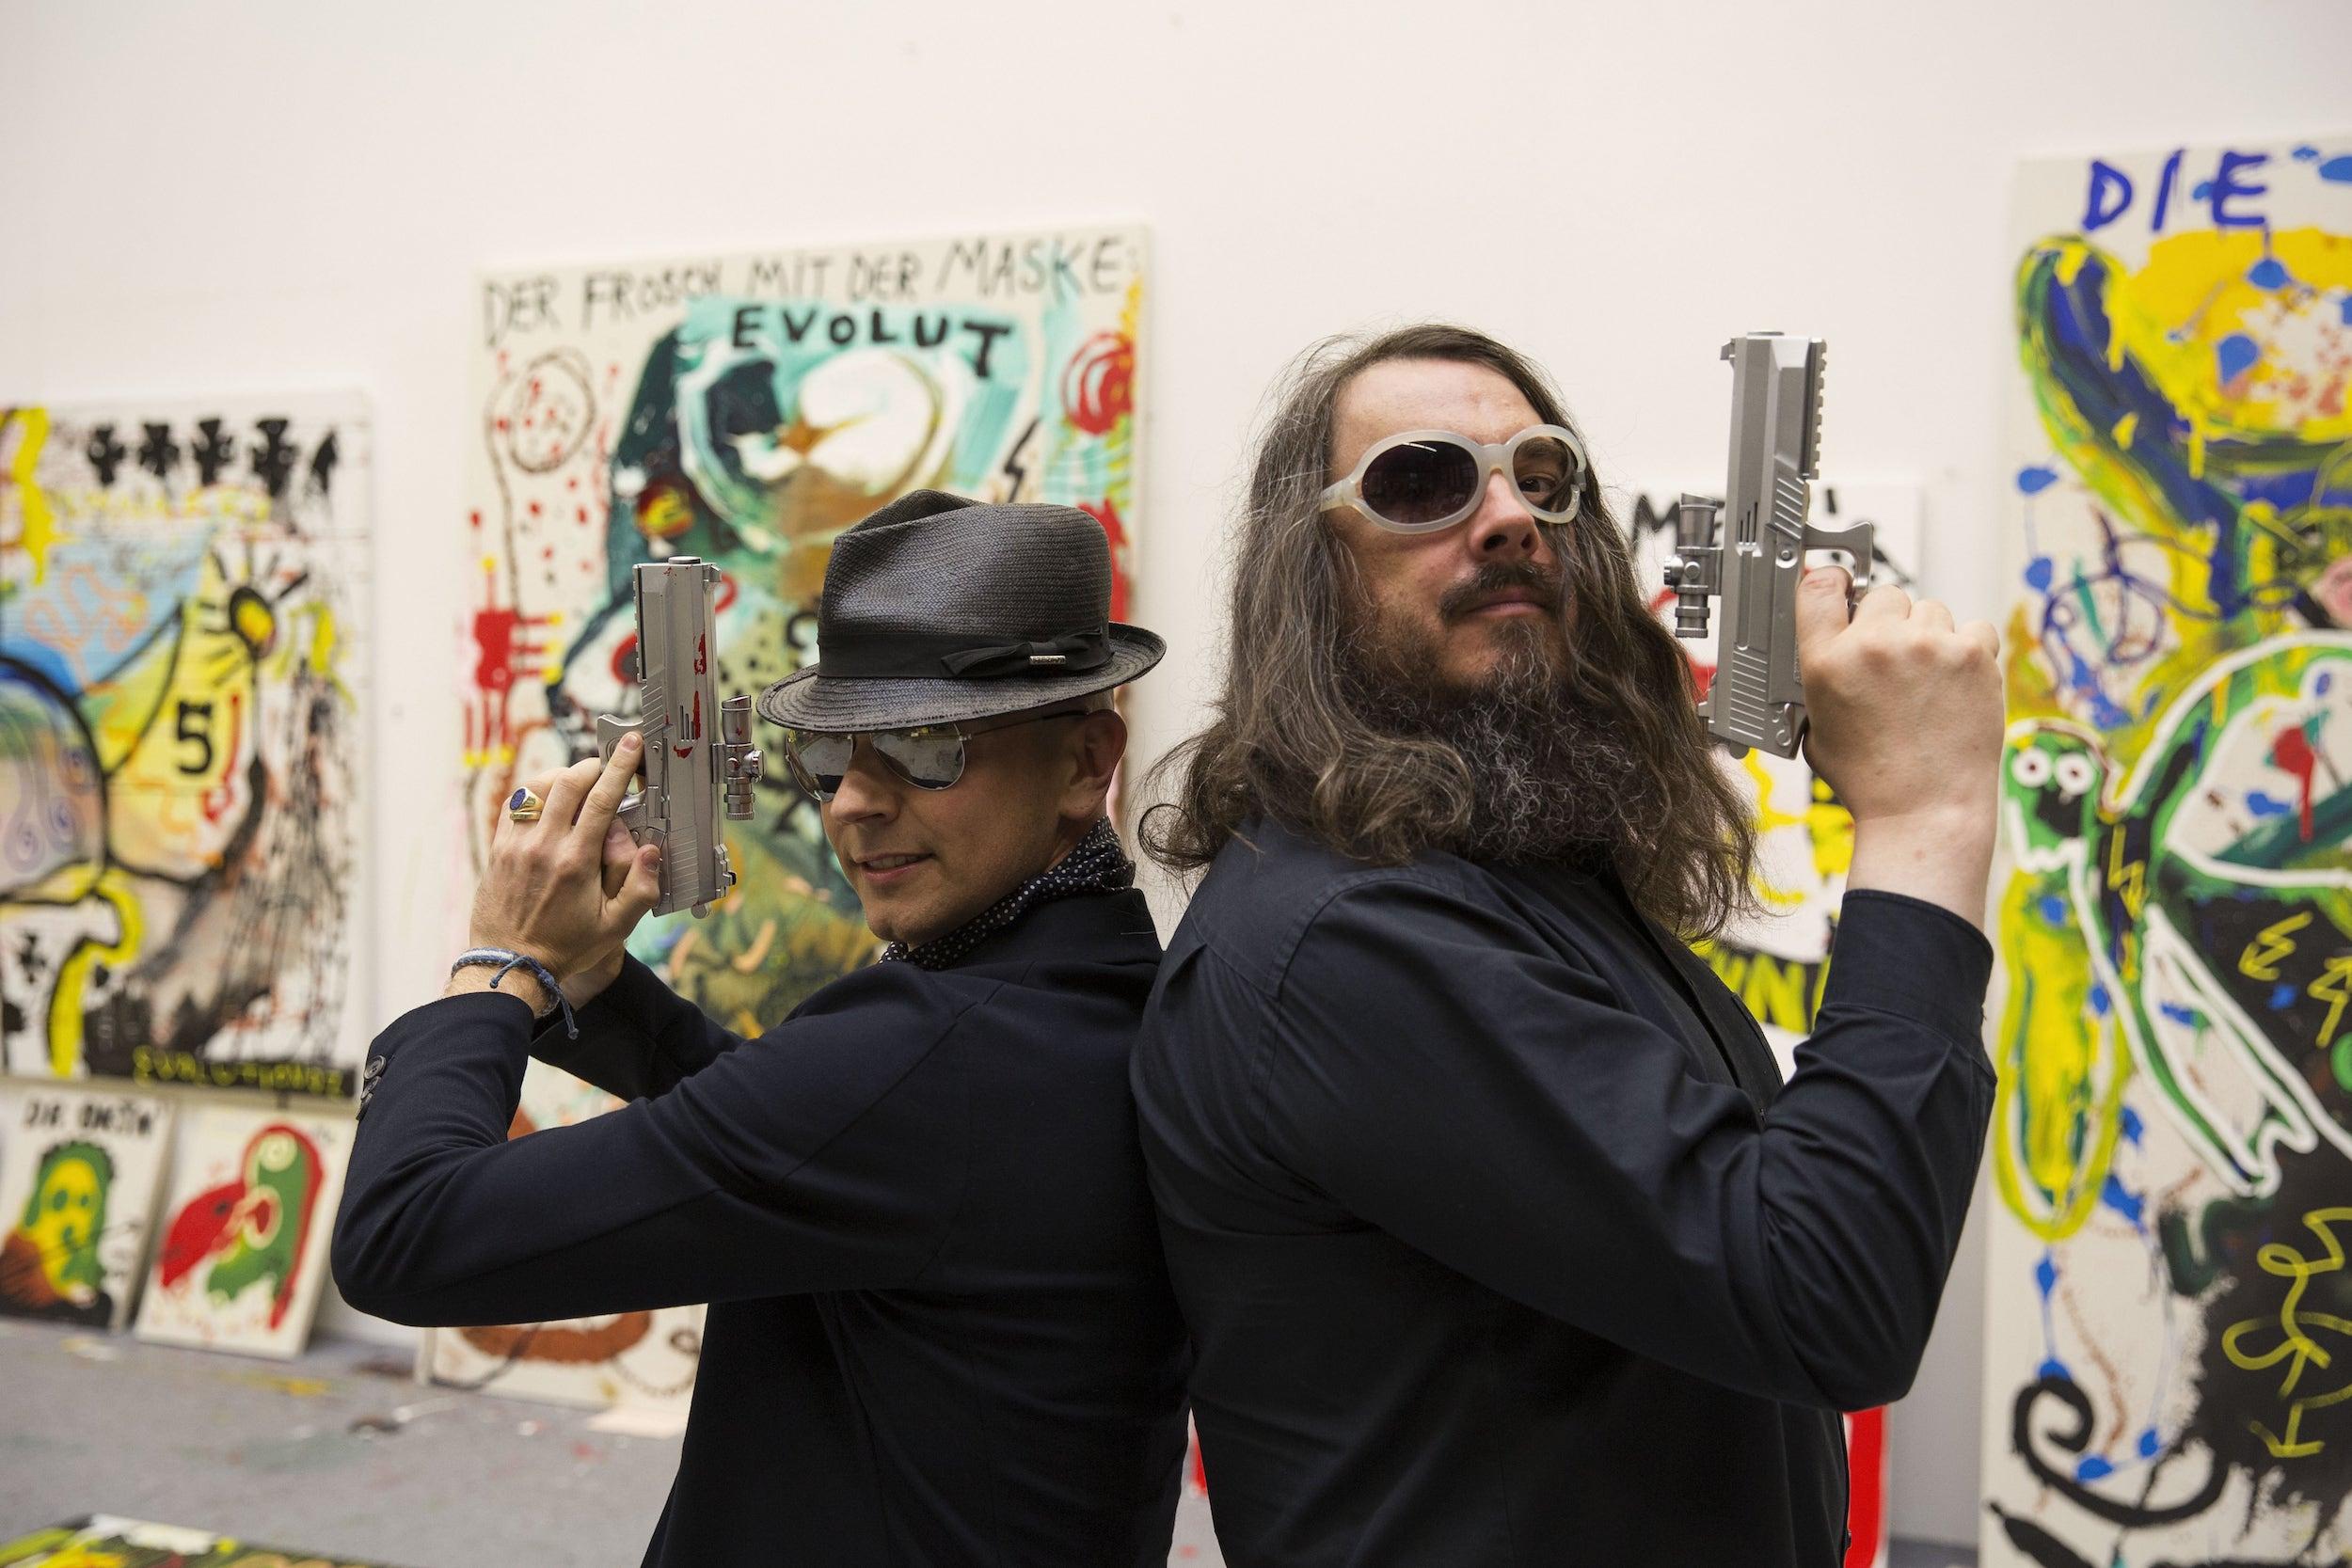 Rene S. Spiegelberger & Jonathan Meese im Atelier